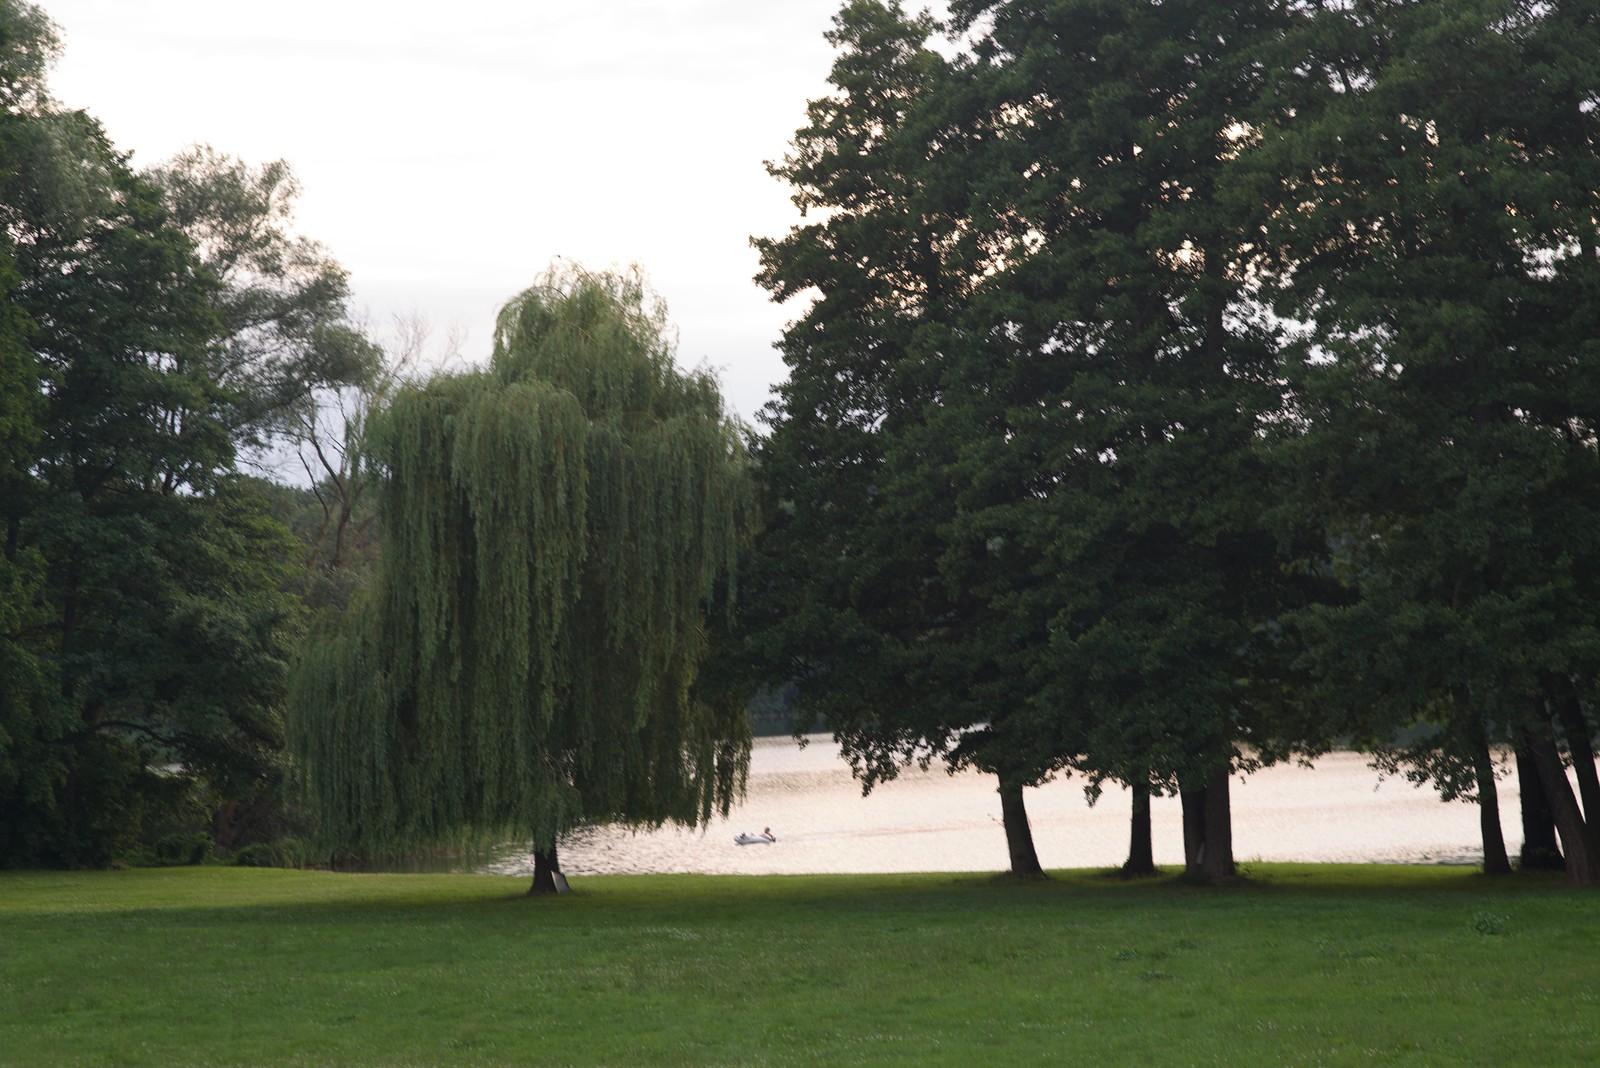 Barnim Nature Park